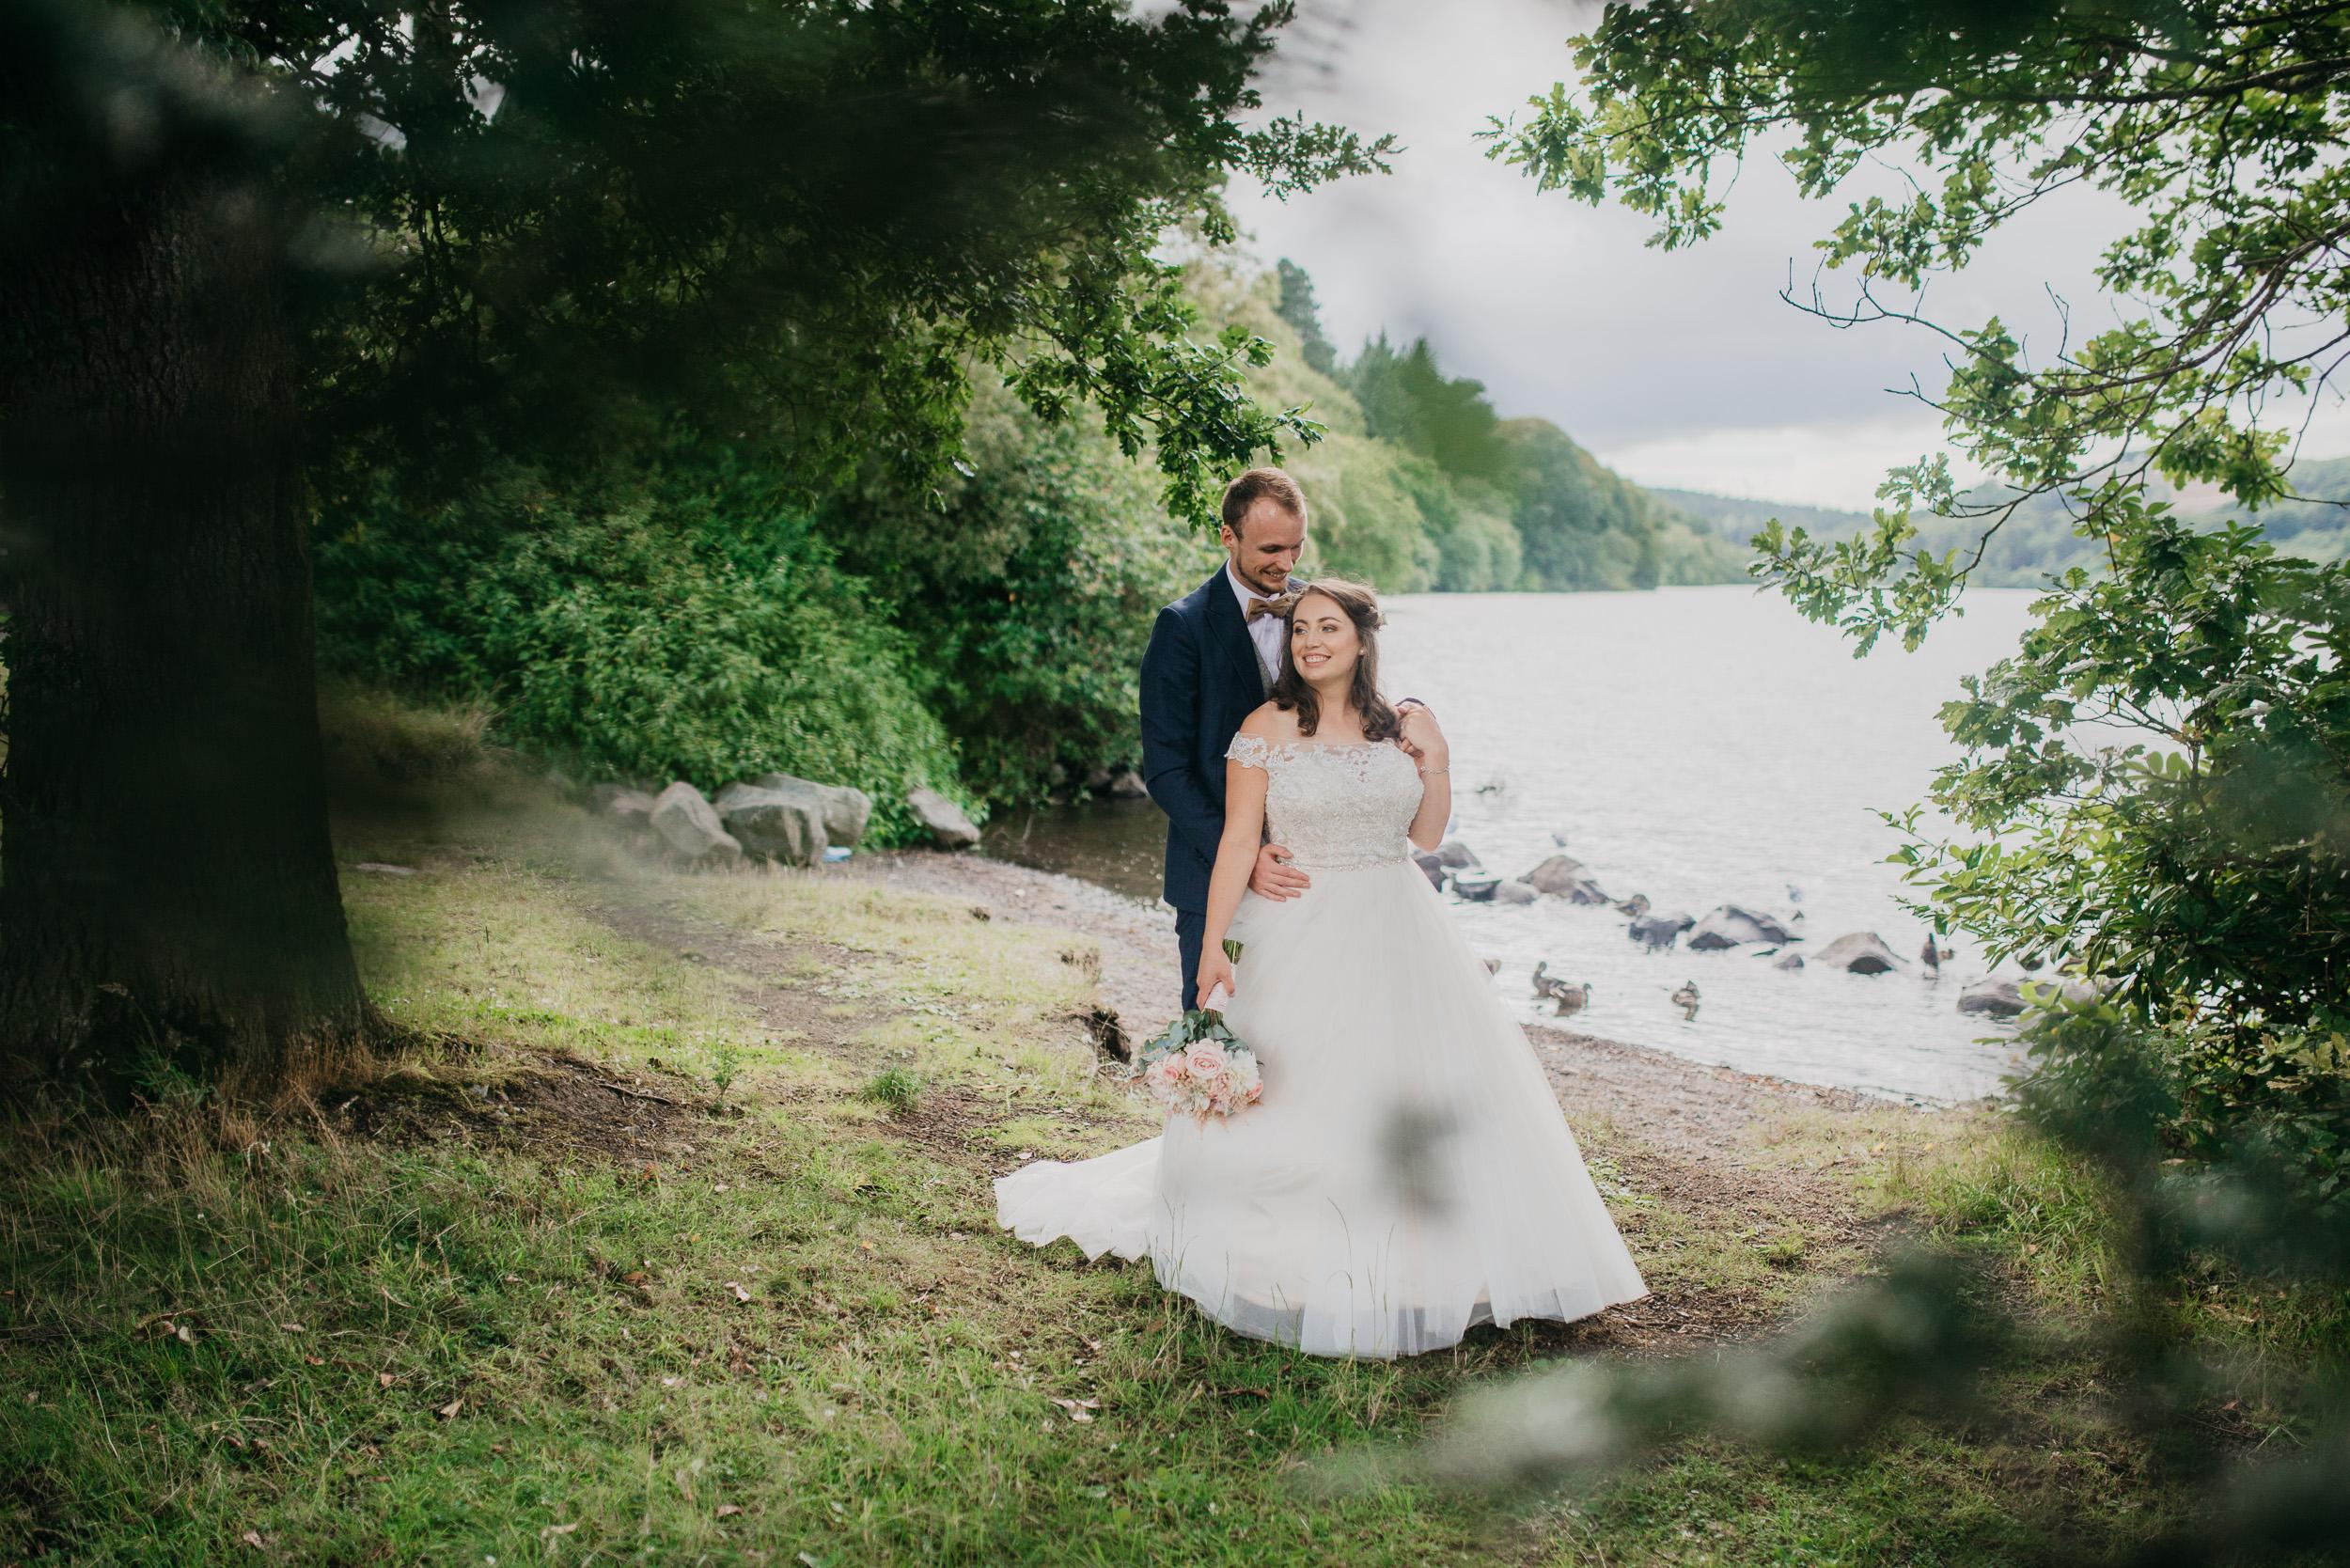 wedding photogaphy peter mackey 2018 jordam-6.jpg